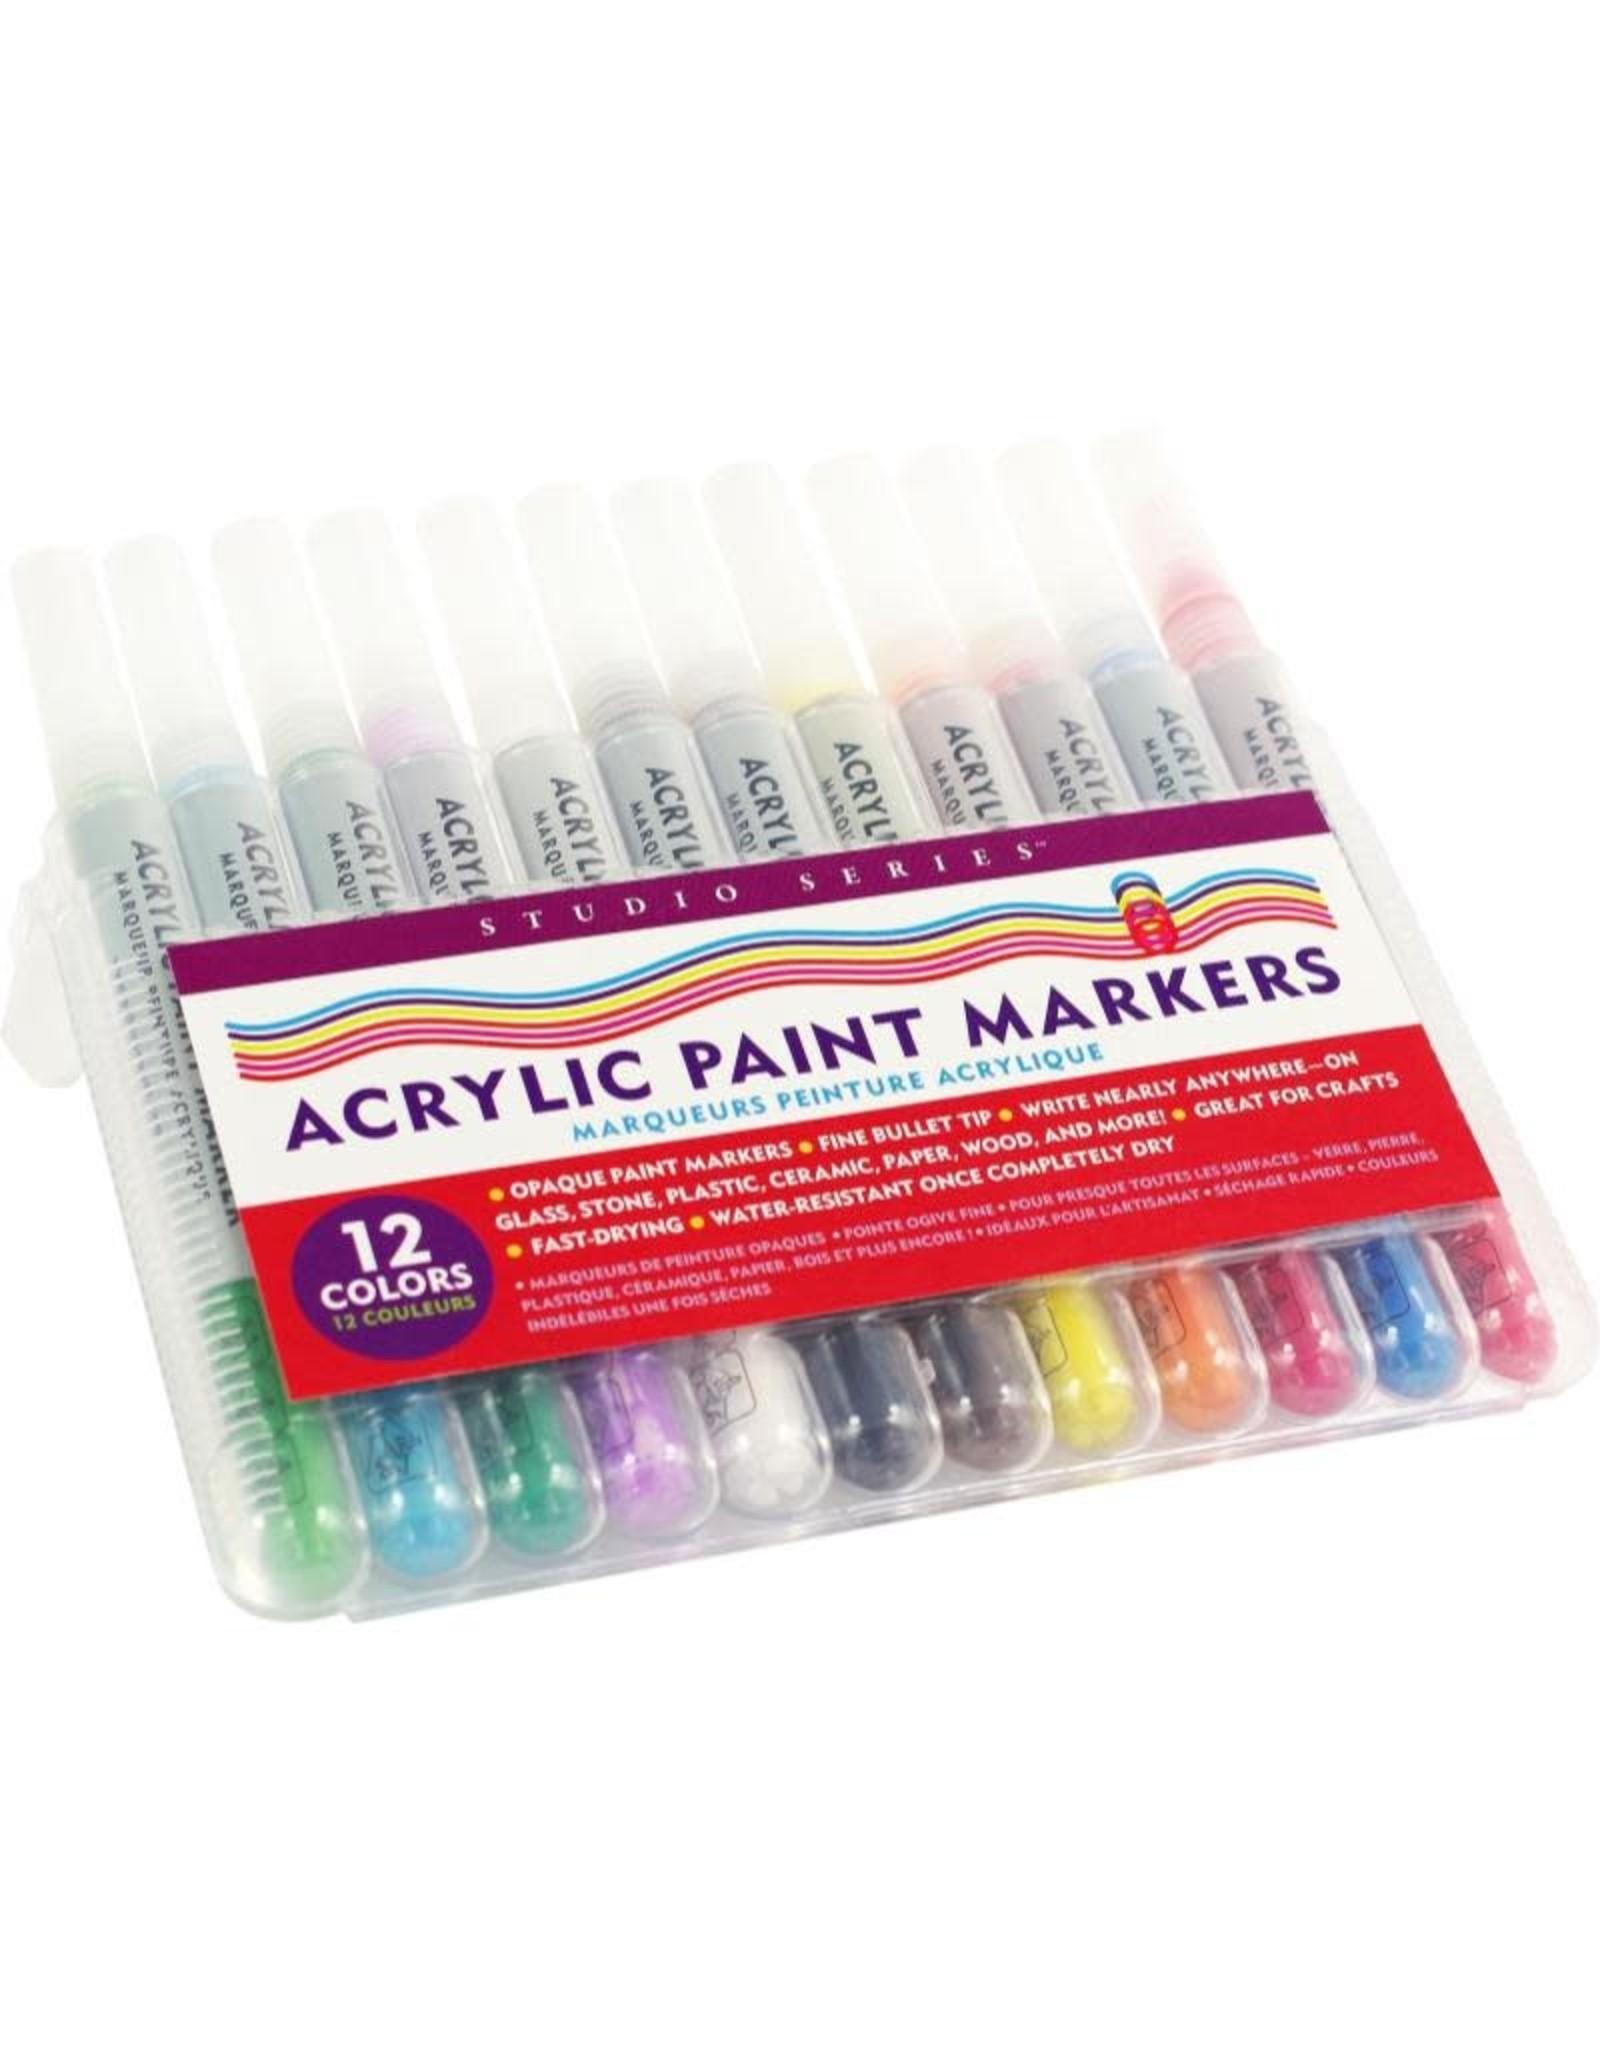 Peter Pauper Acrylic Paint Markers